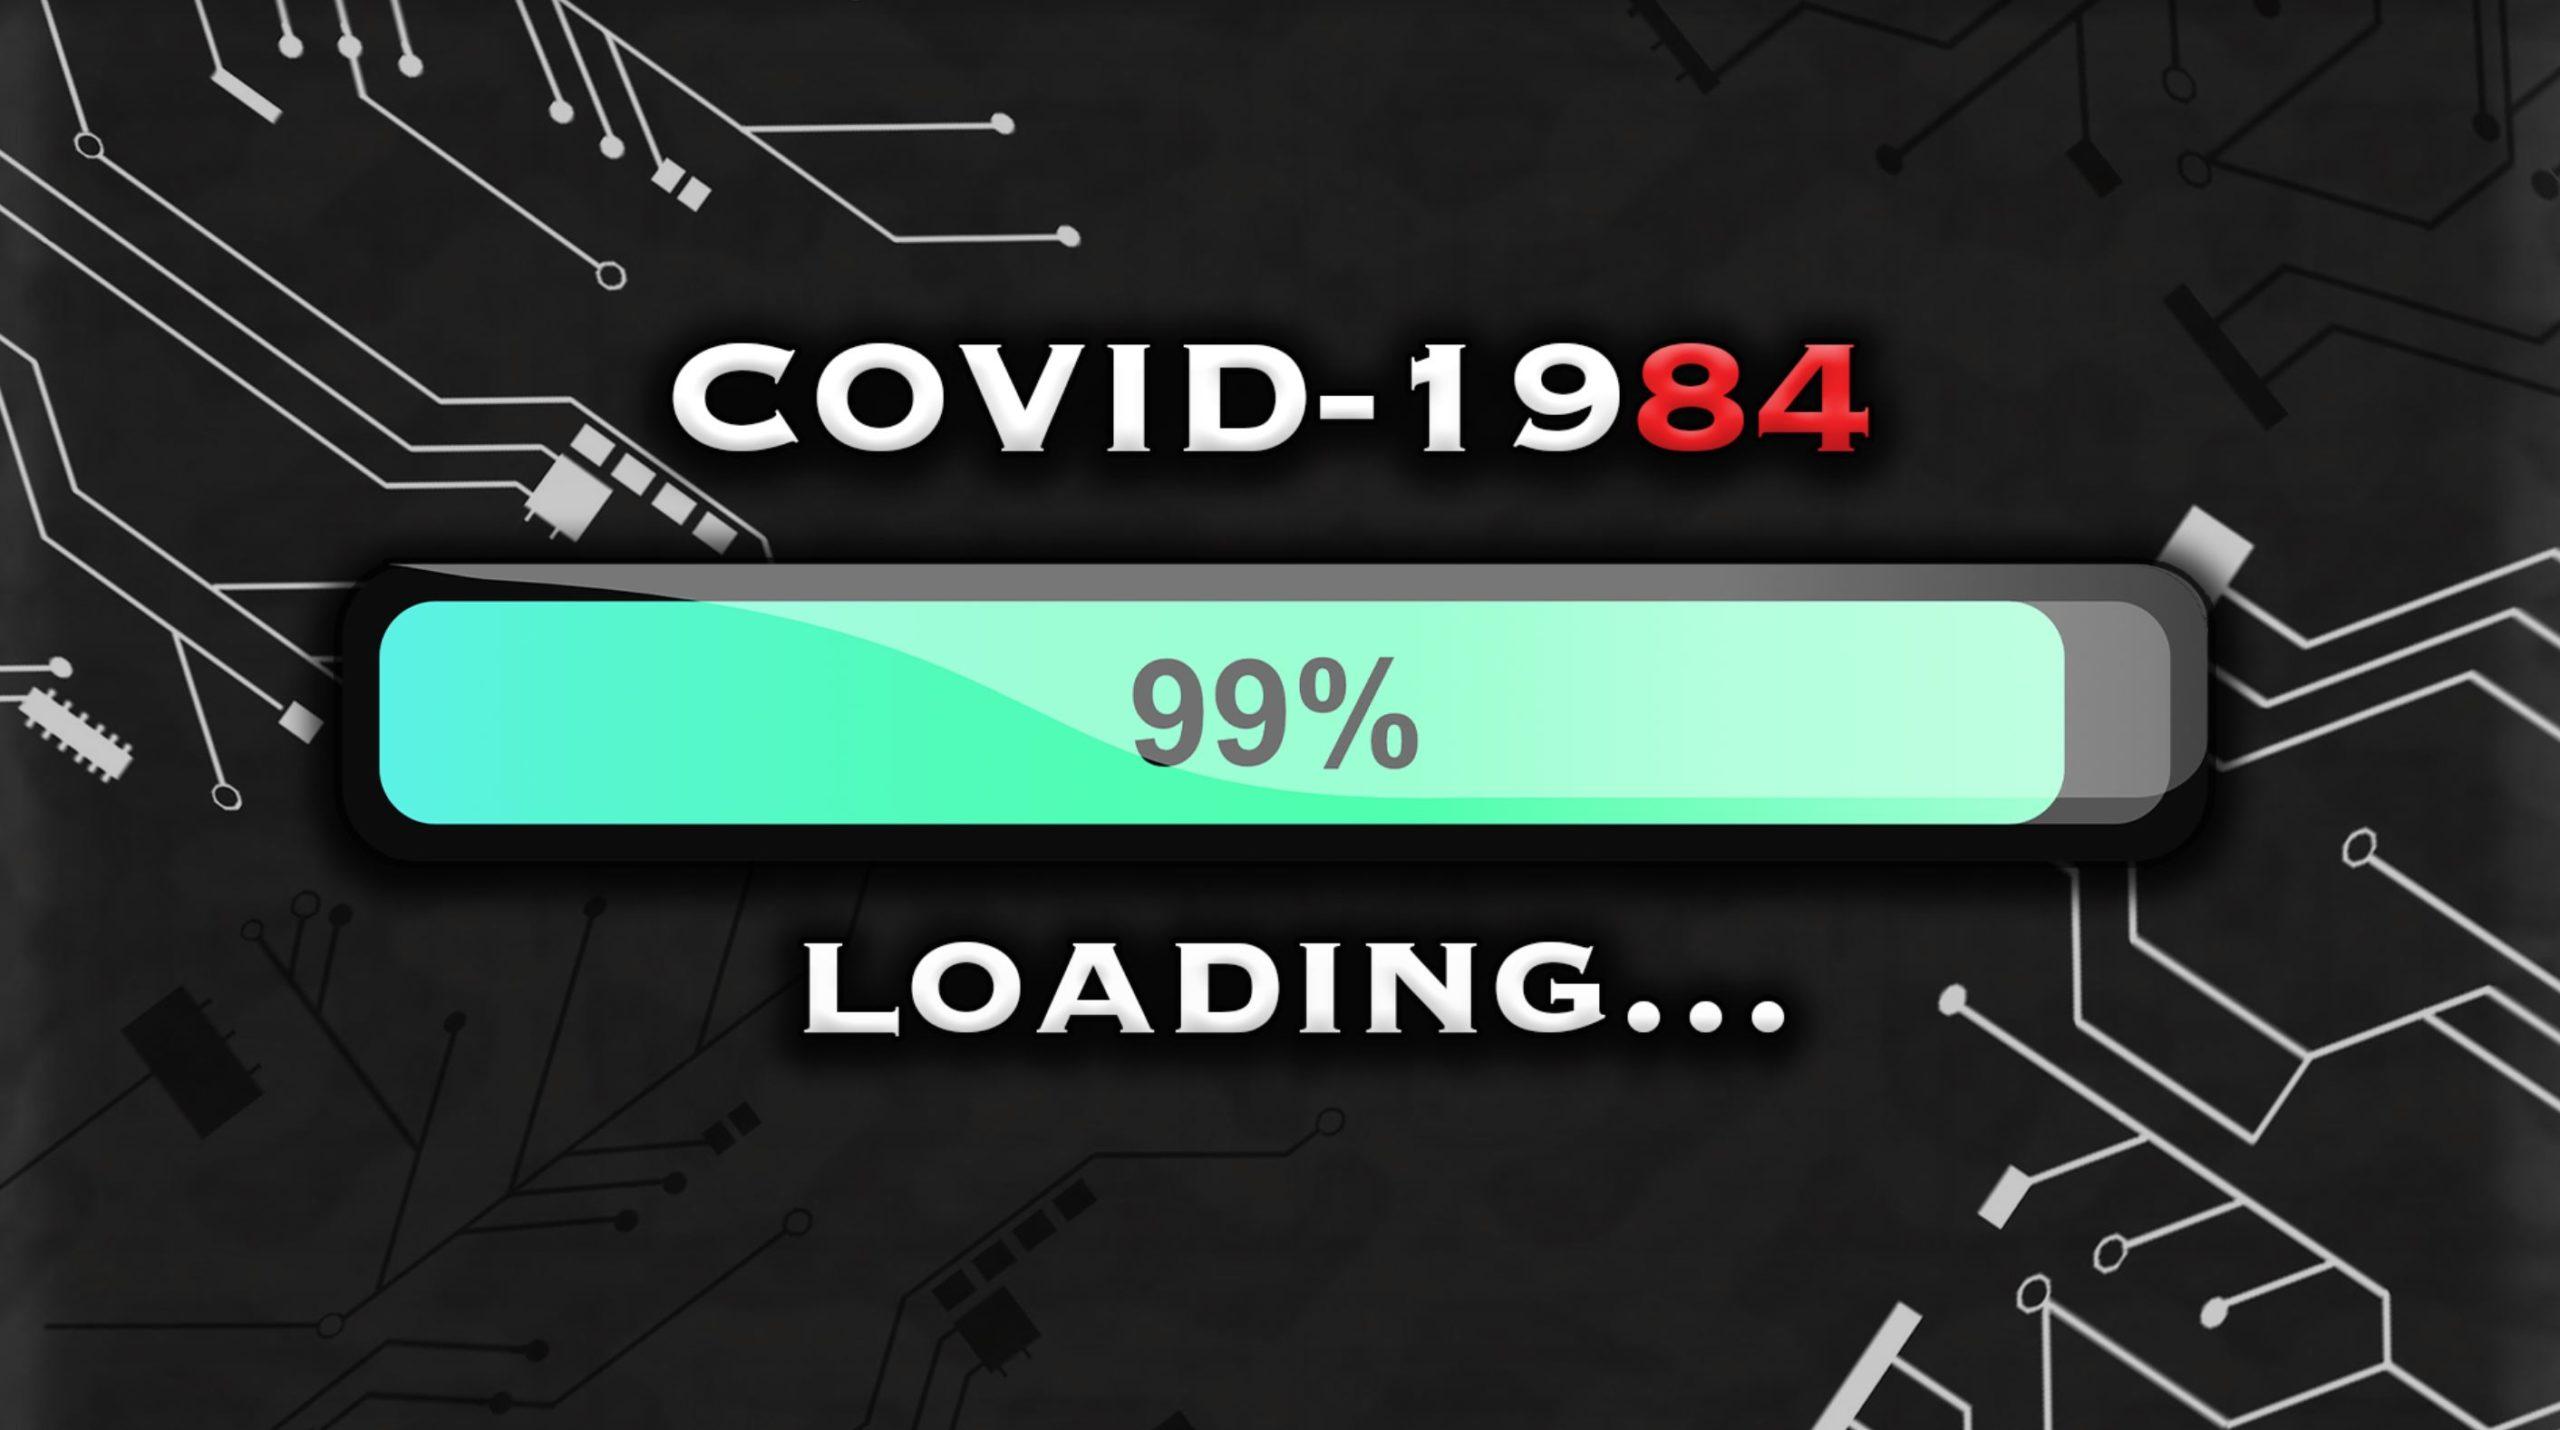 Covid-1984: Censorship & Medical Tyranny (with Spiro Skouras)